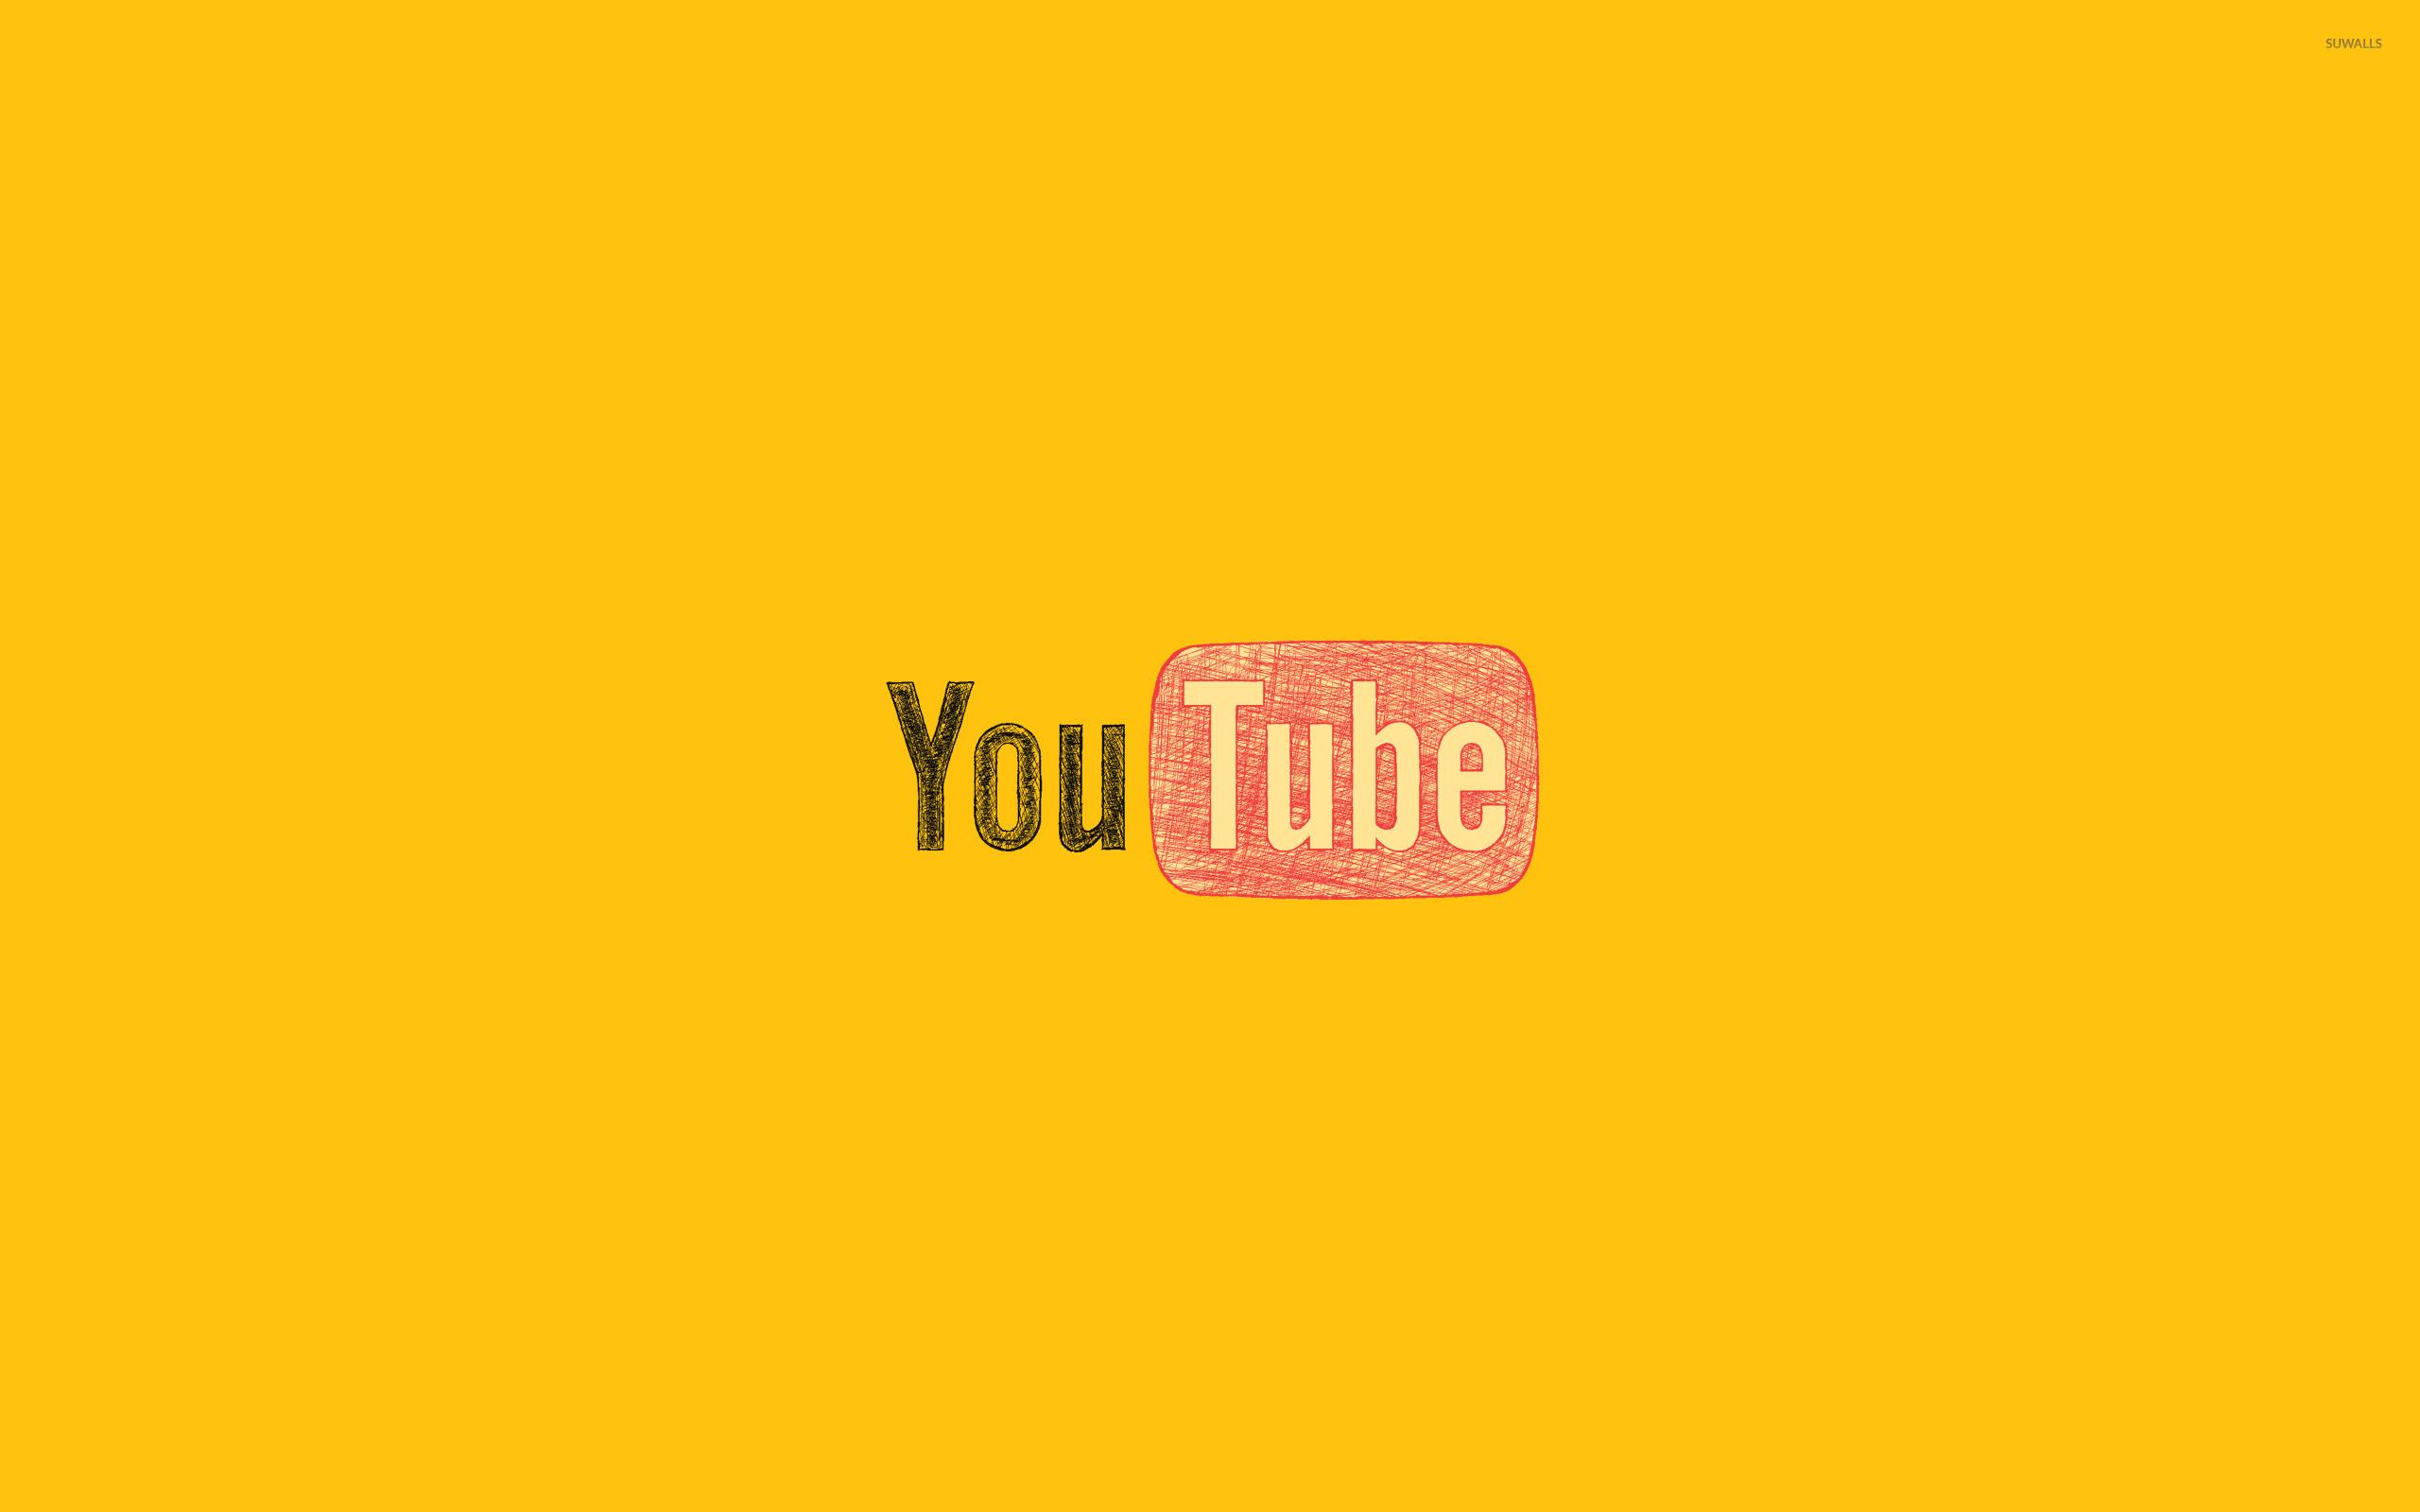 youtube background wallpaper 68959